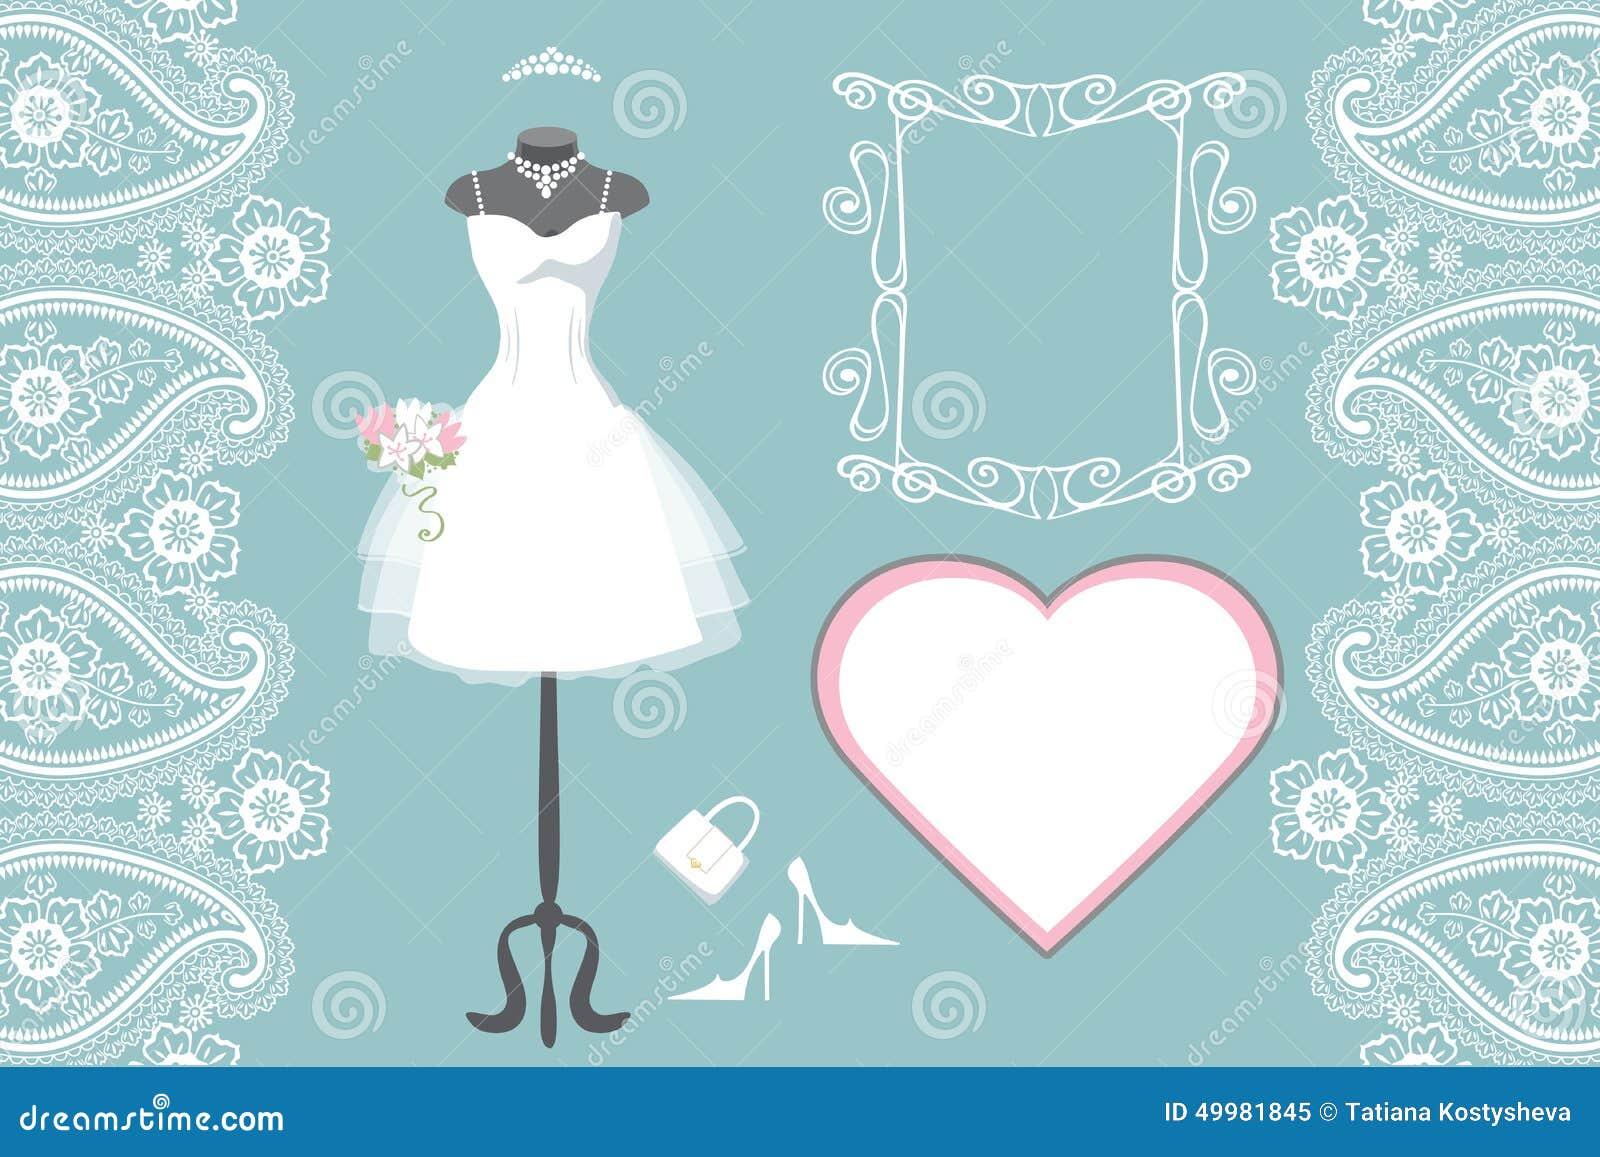 Heiratendes Brautkleid Mit Rahmen, Aufkleber, Paisley Vektor ...